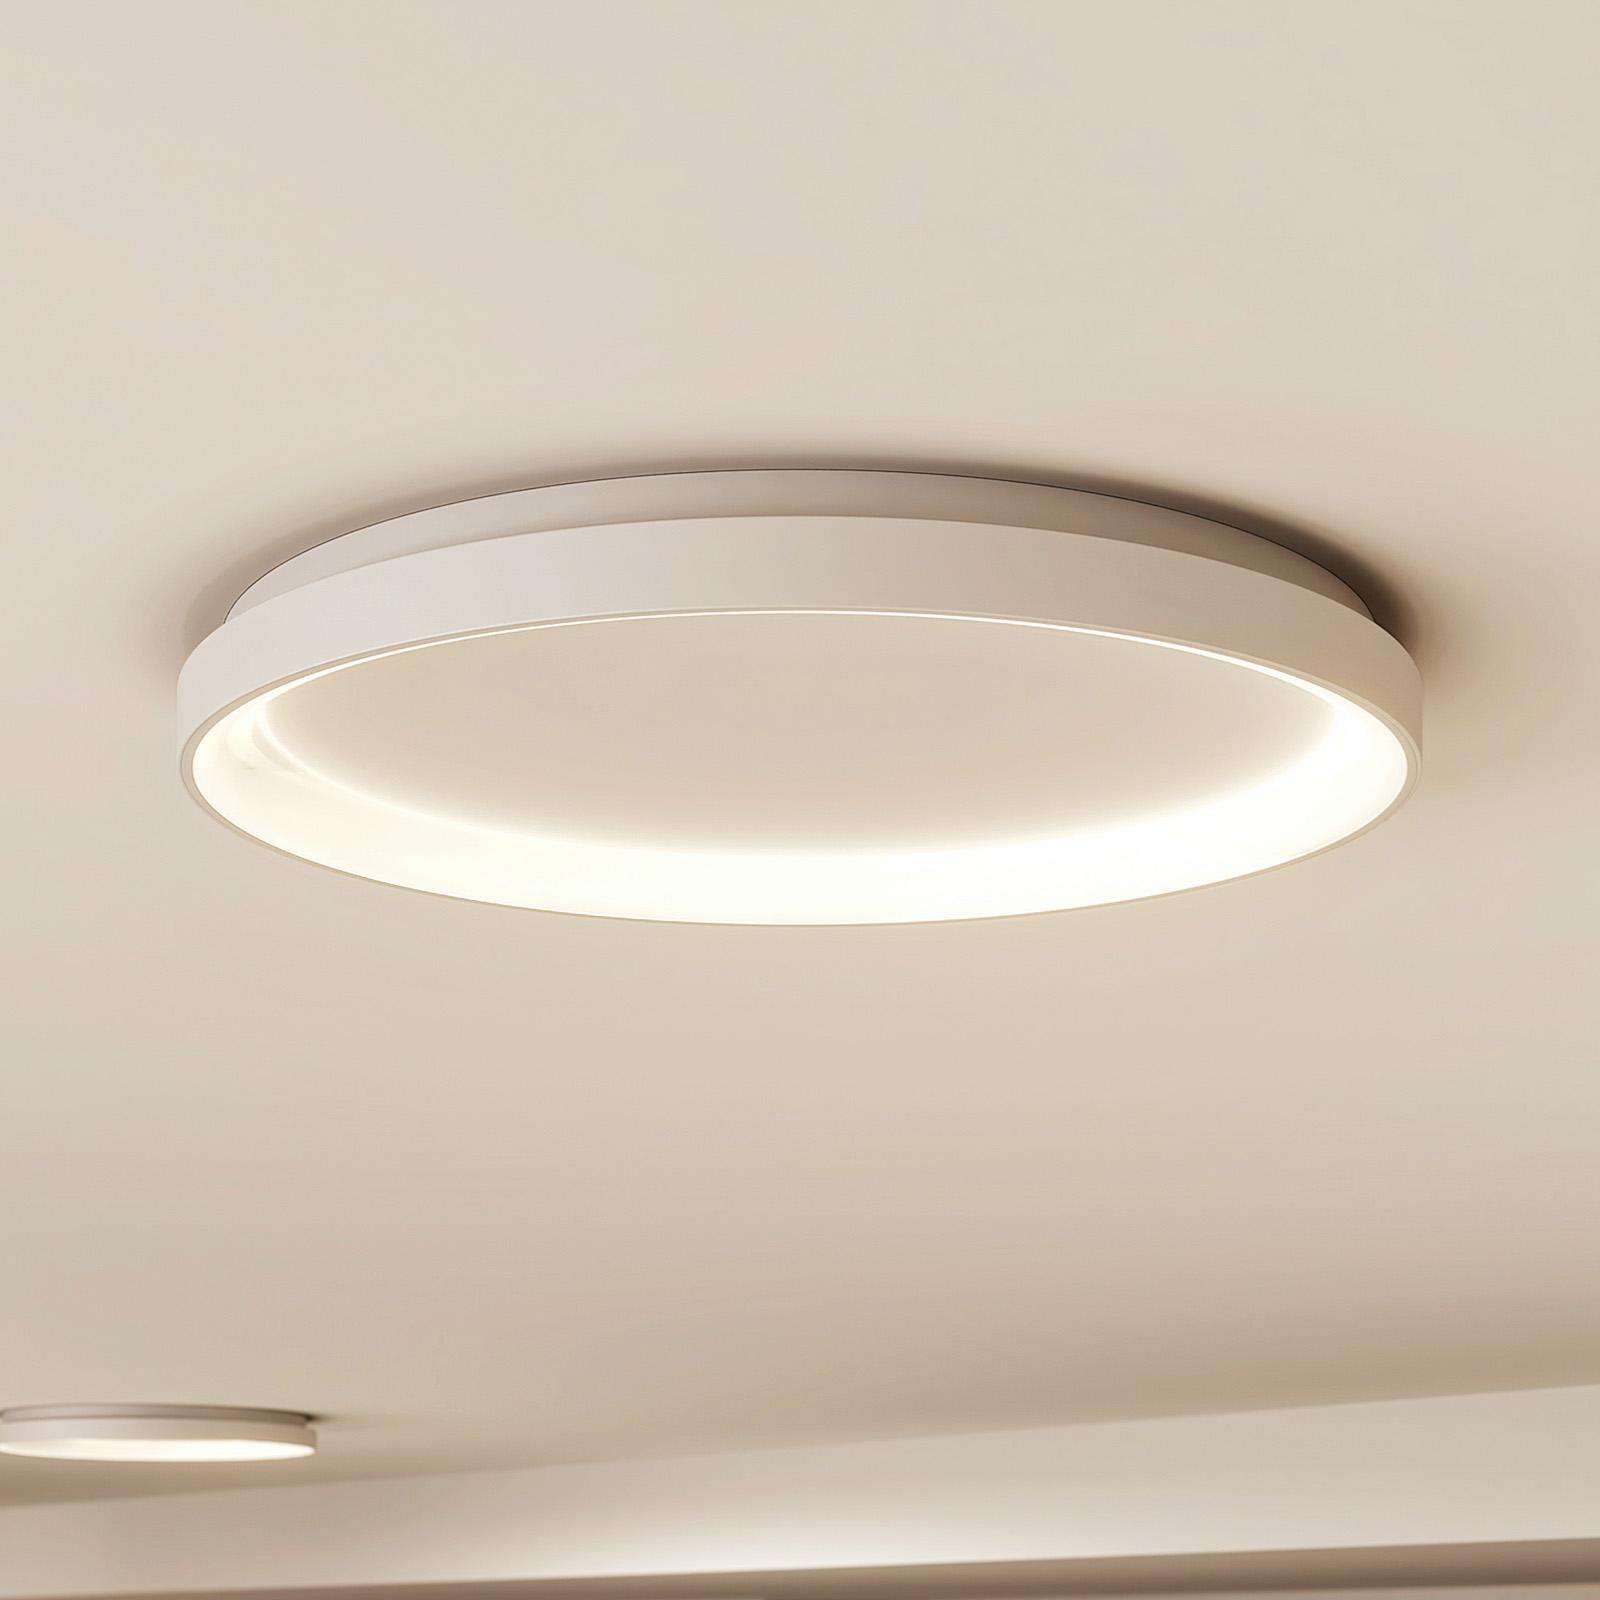 Arcchio Vivy LED-taklampe, hvit, 58 cm